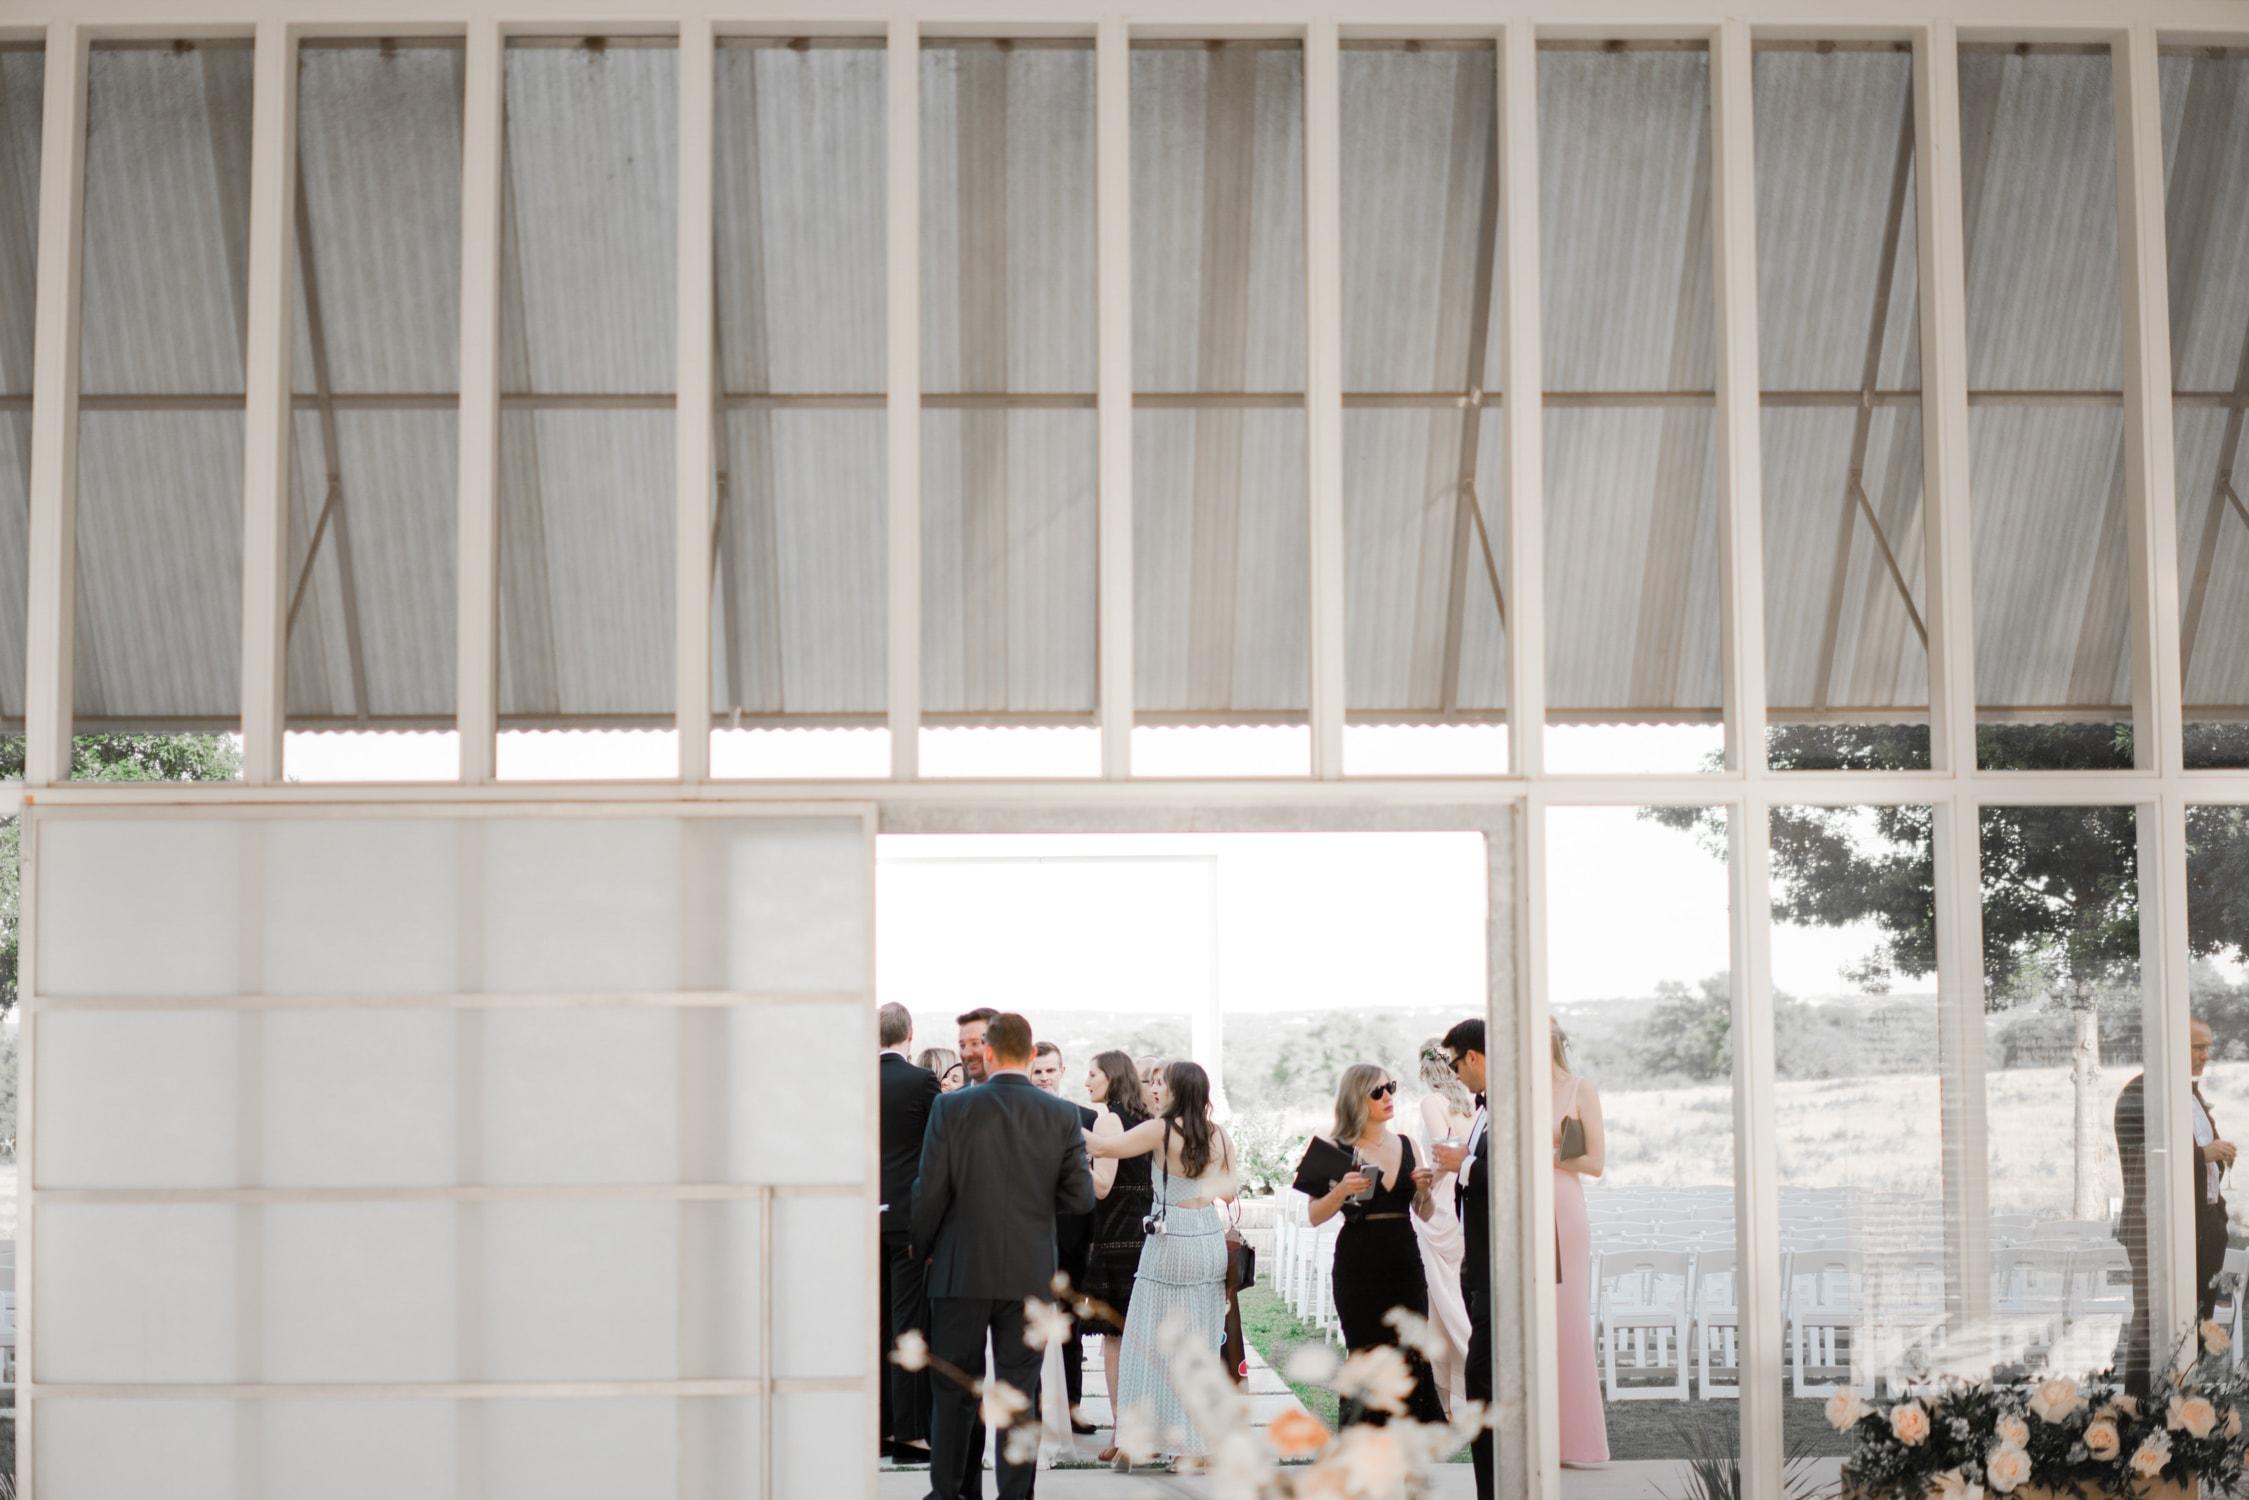 prospect-house-wedding-37.jpg